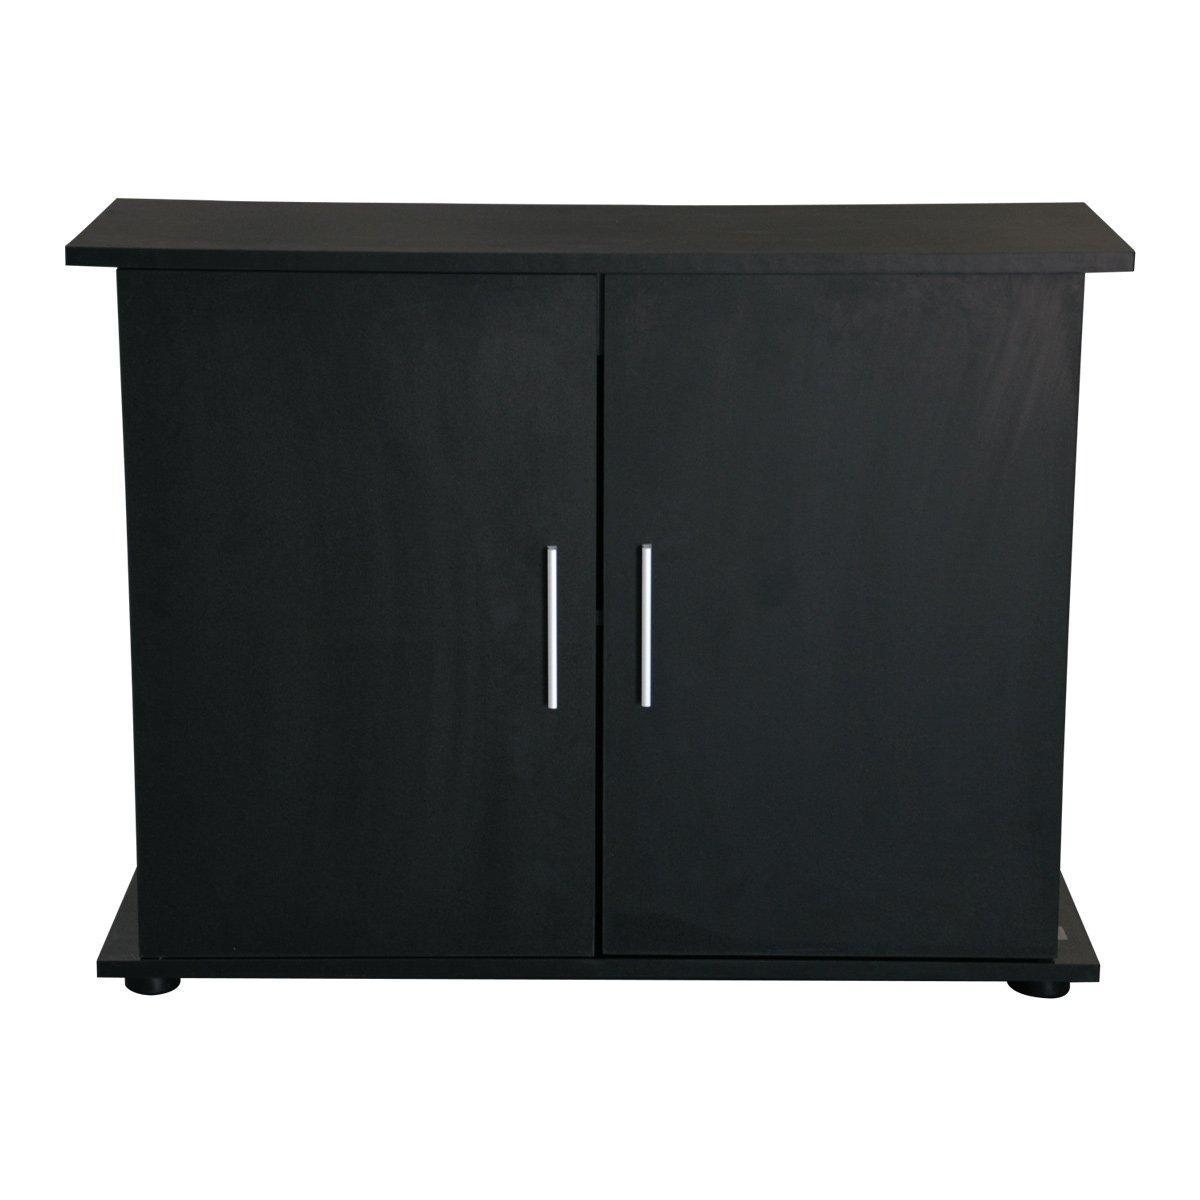 Seapora 52016 Empress Cabinet Stand, 36'' x 12'', Black